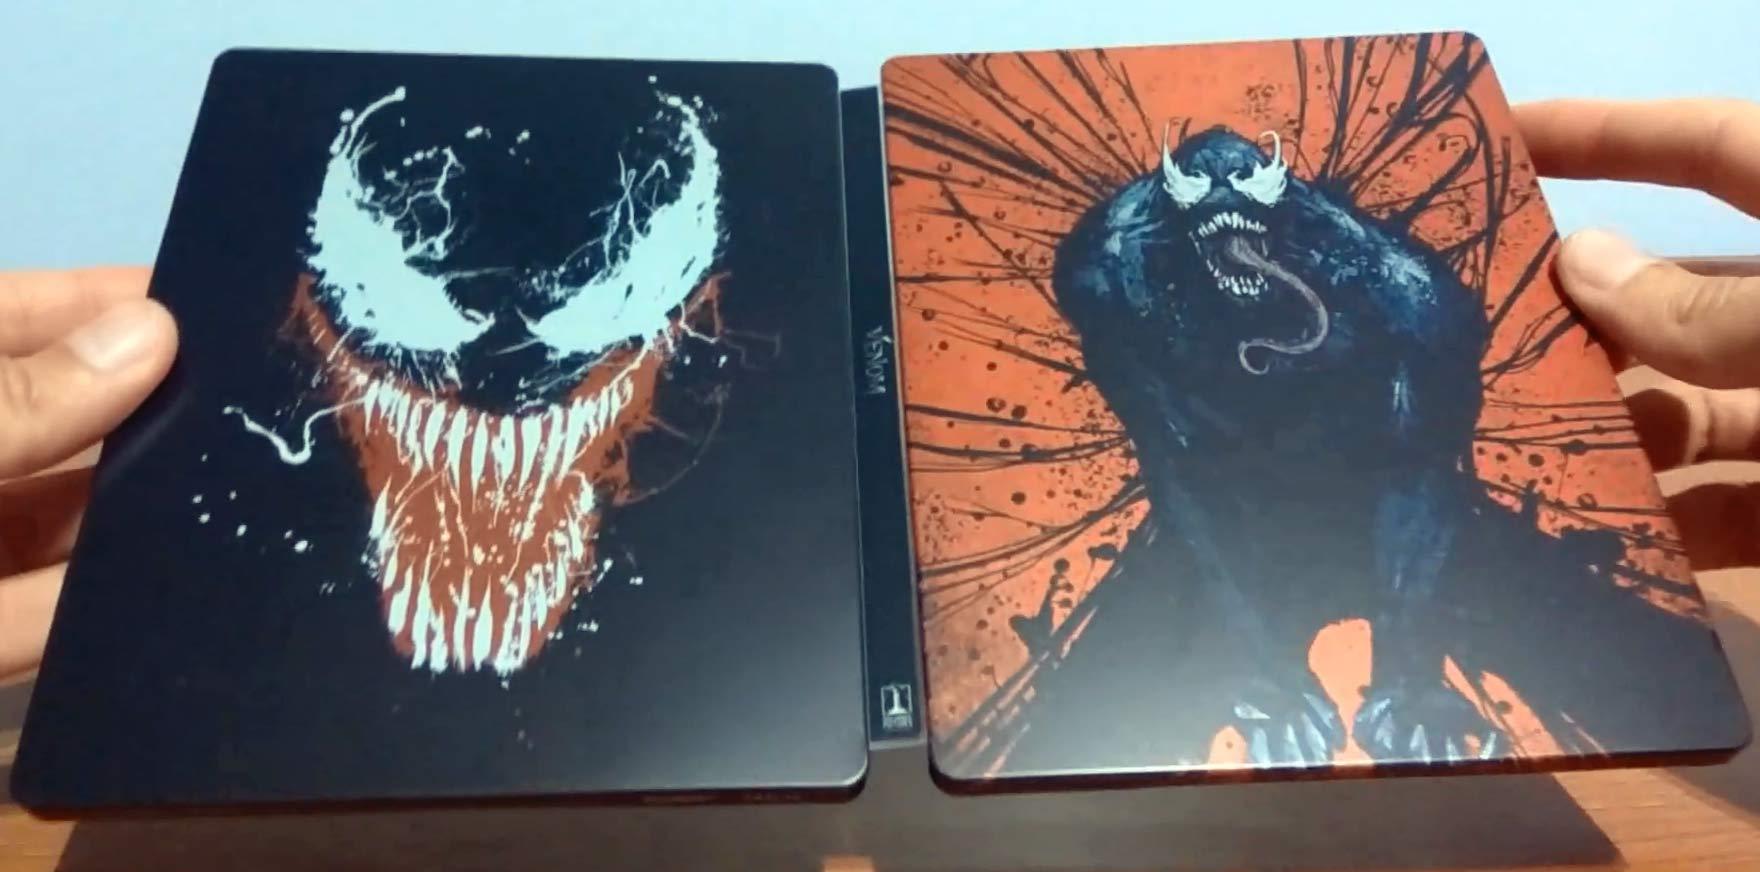 Venom-steelbook-4-1.jpg